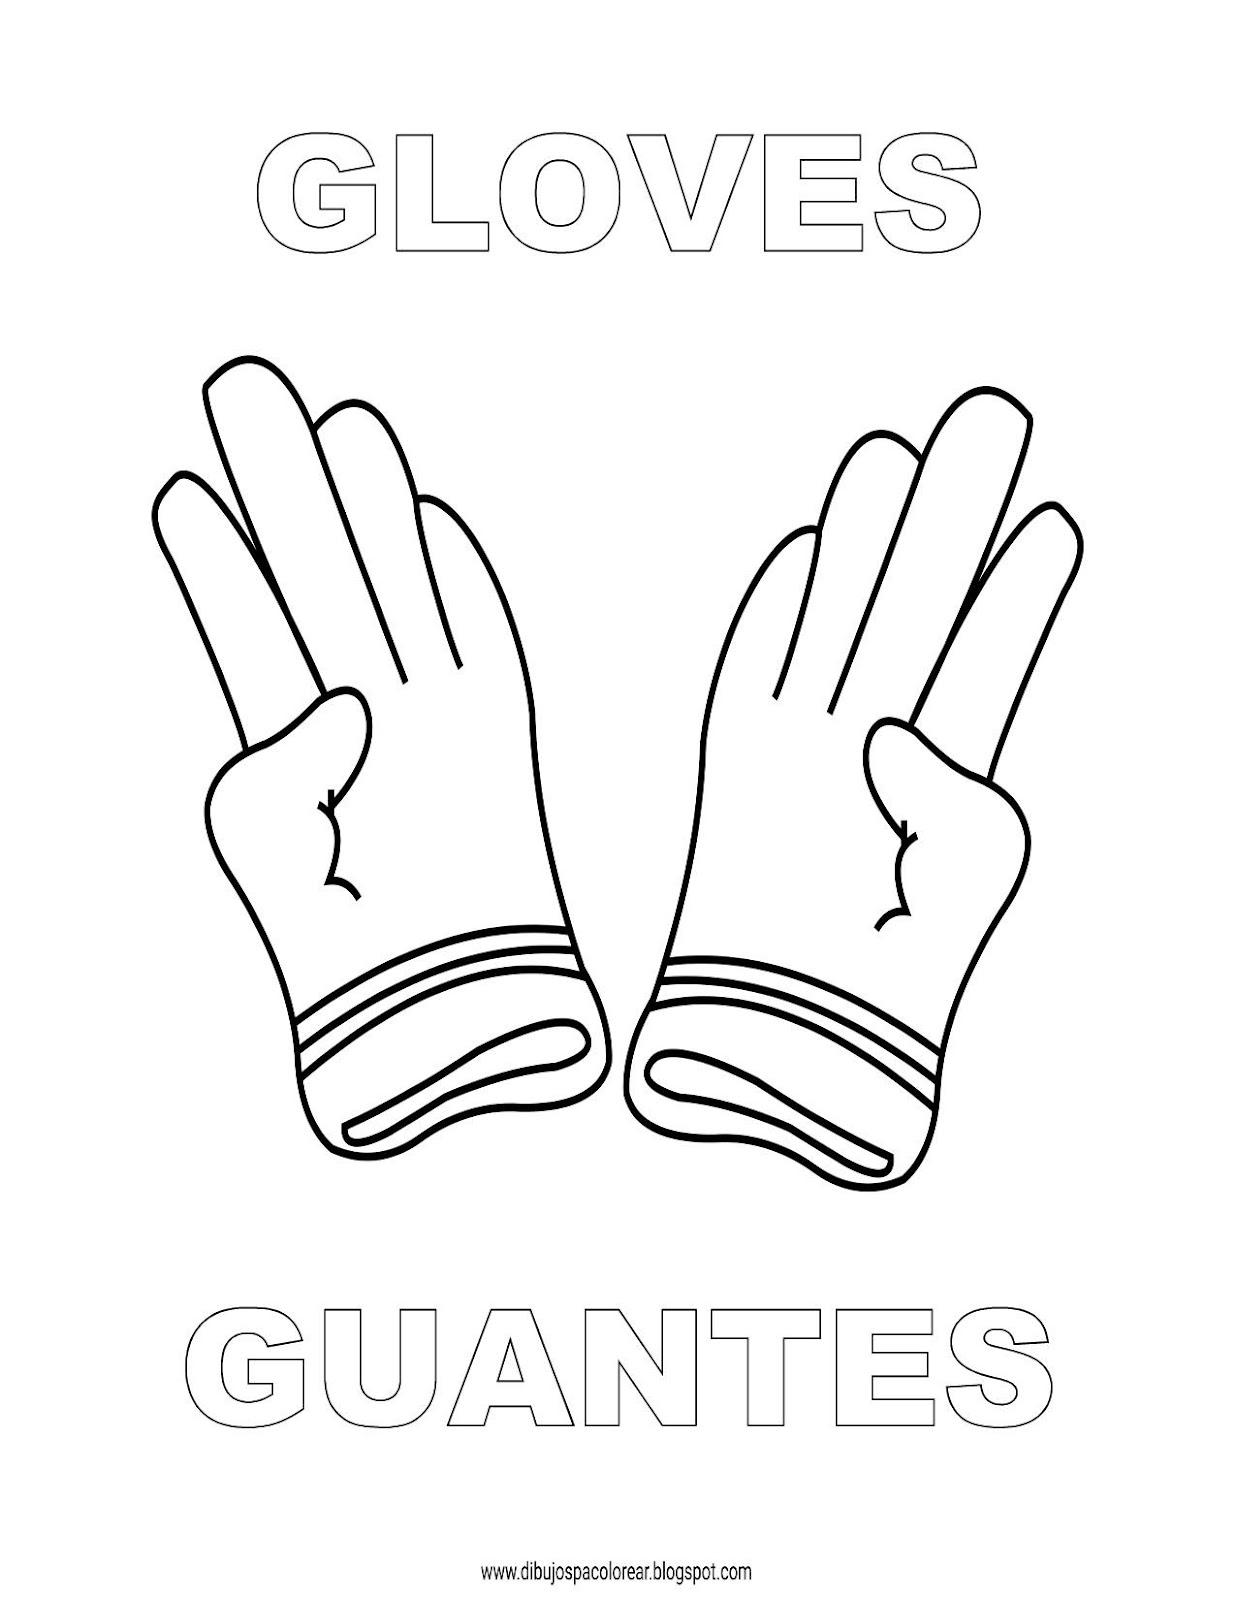 Dibujos Ingles Espanol Con G Guantes Gloves